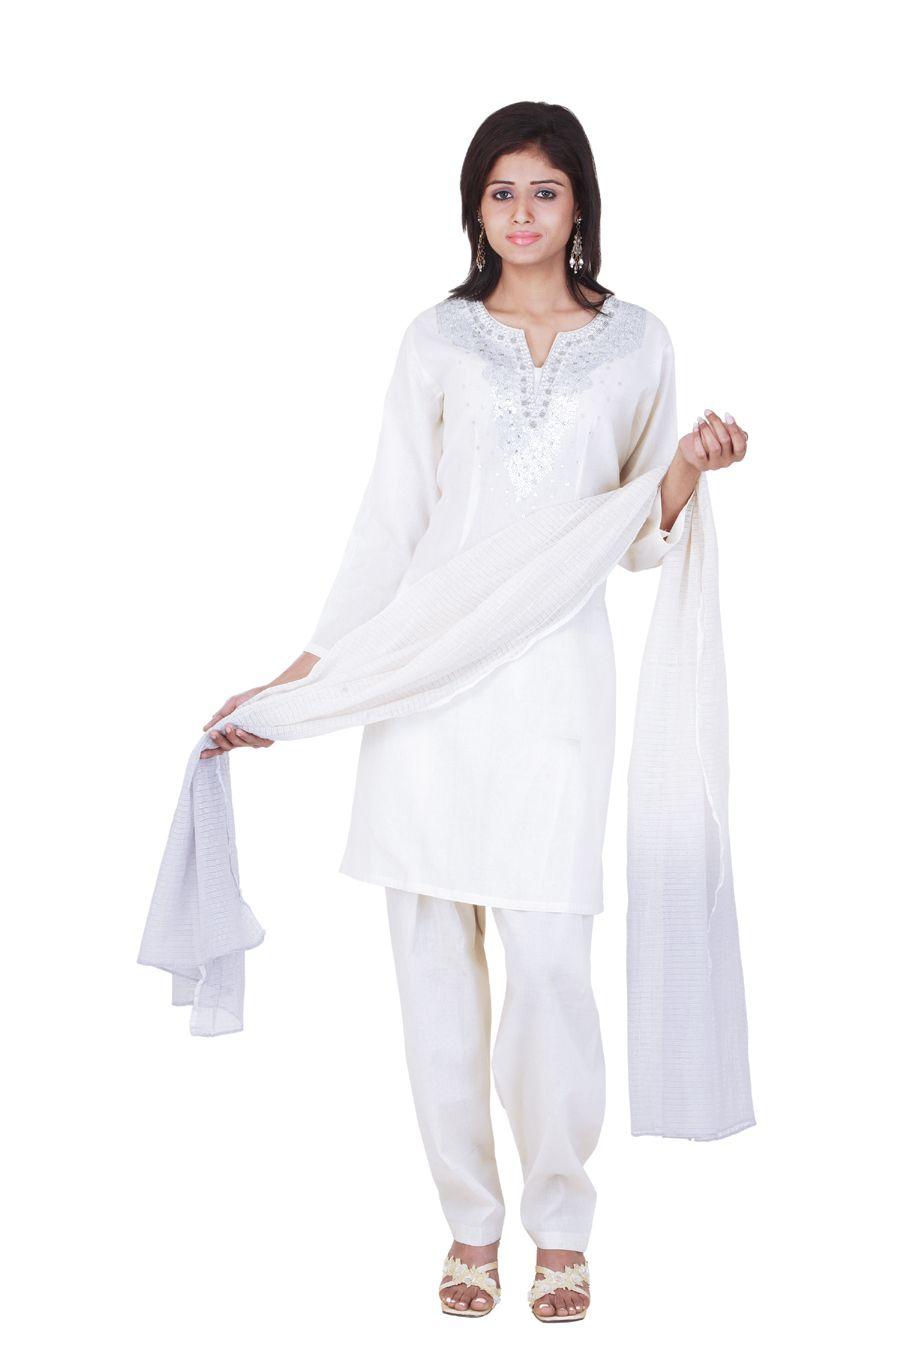 white churidar suit for women - Google Search   Wedding ...